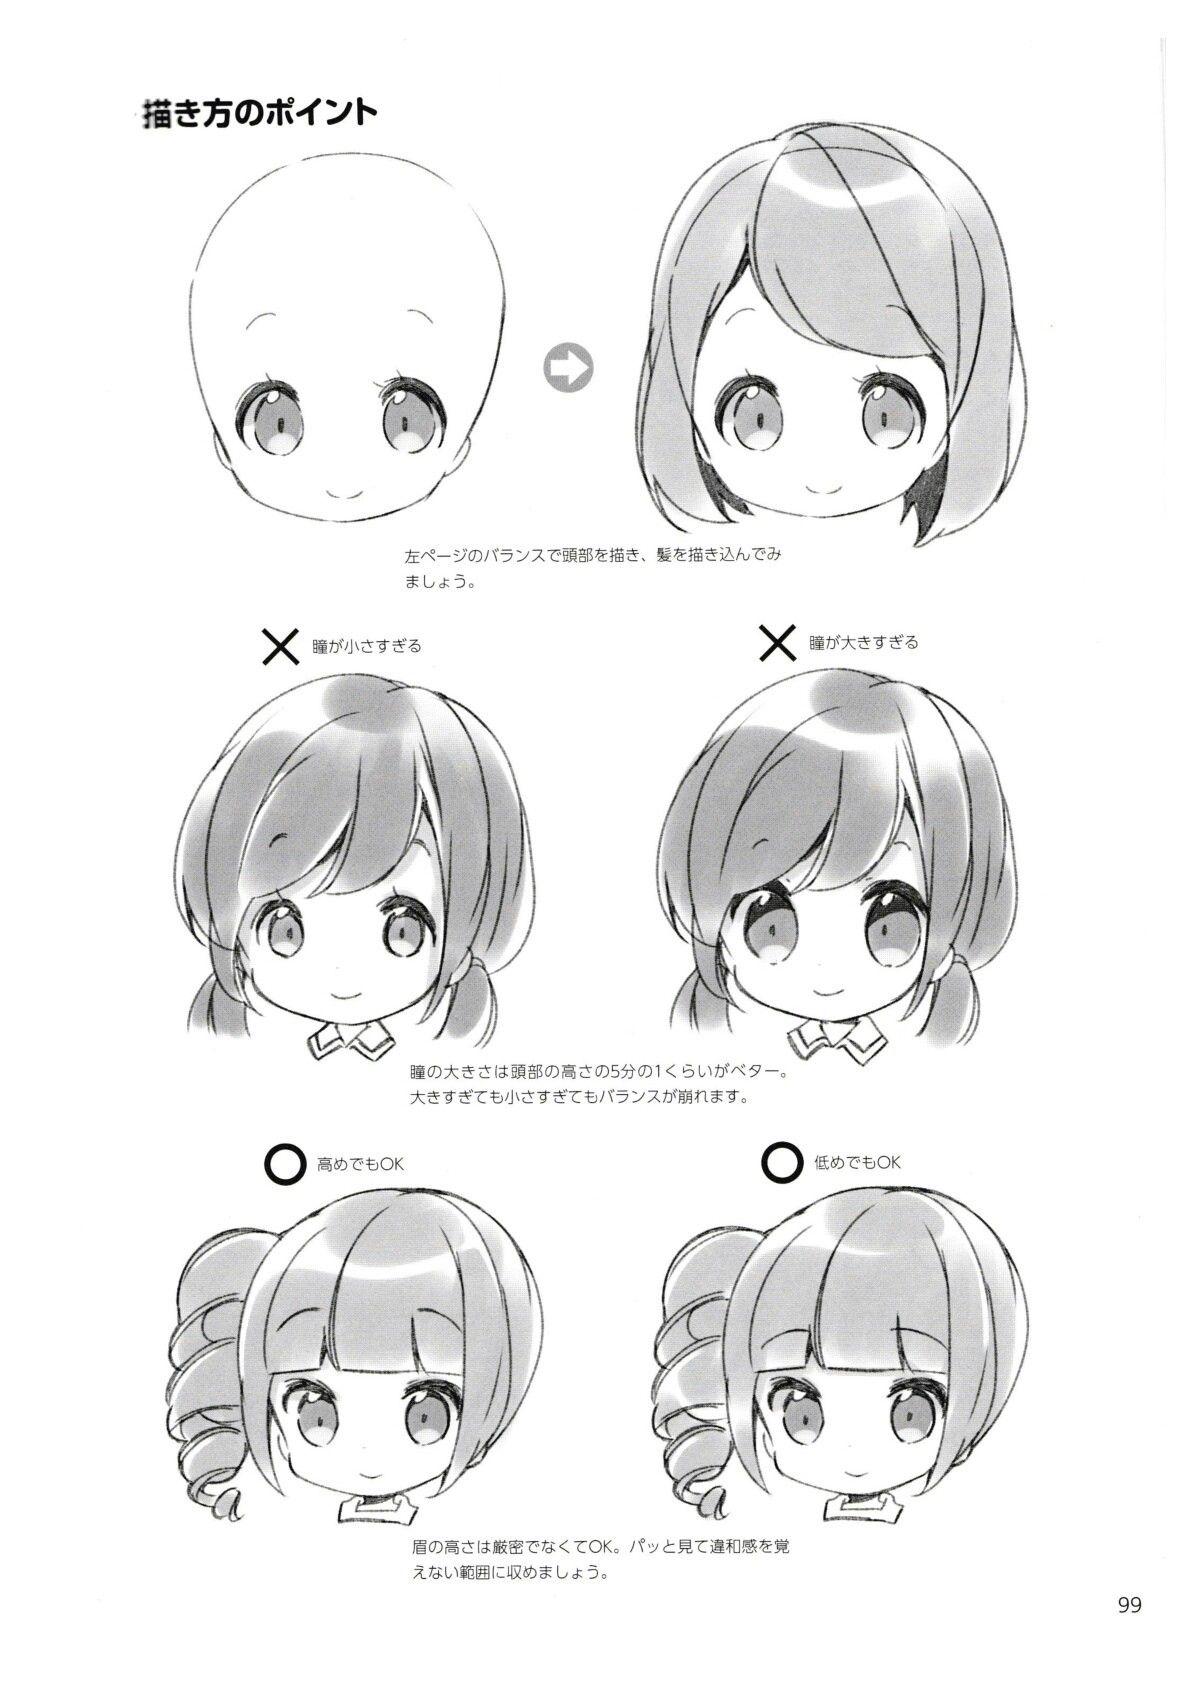 How To Draw Chibis 99 Anime Drawing Books Manga Drawing Tutorials Chibi Drawings